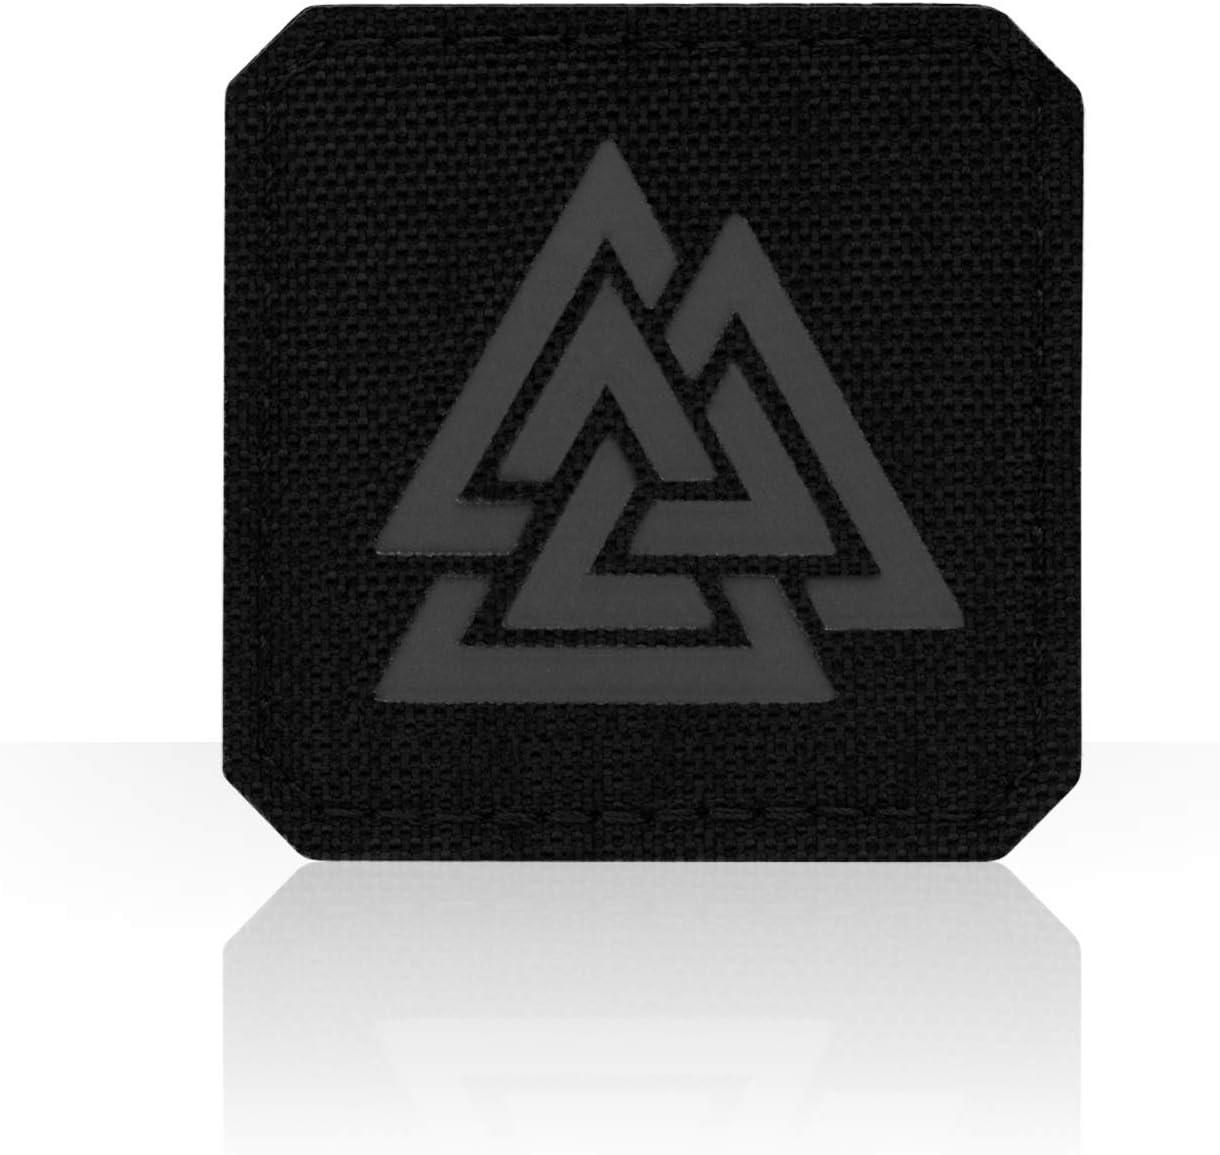 norse viking valknut infrared IR blackout 2x2 tactical laser fastener patch